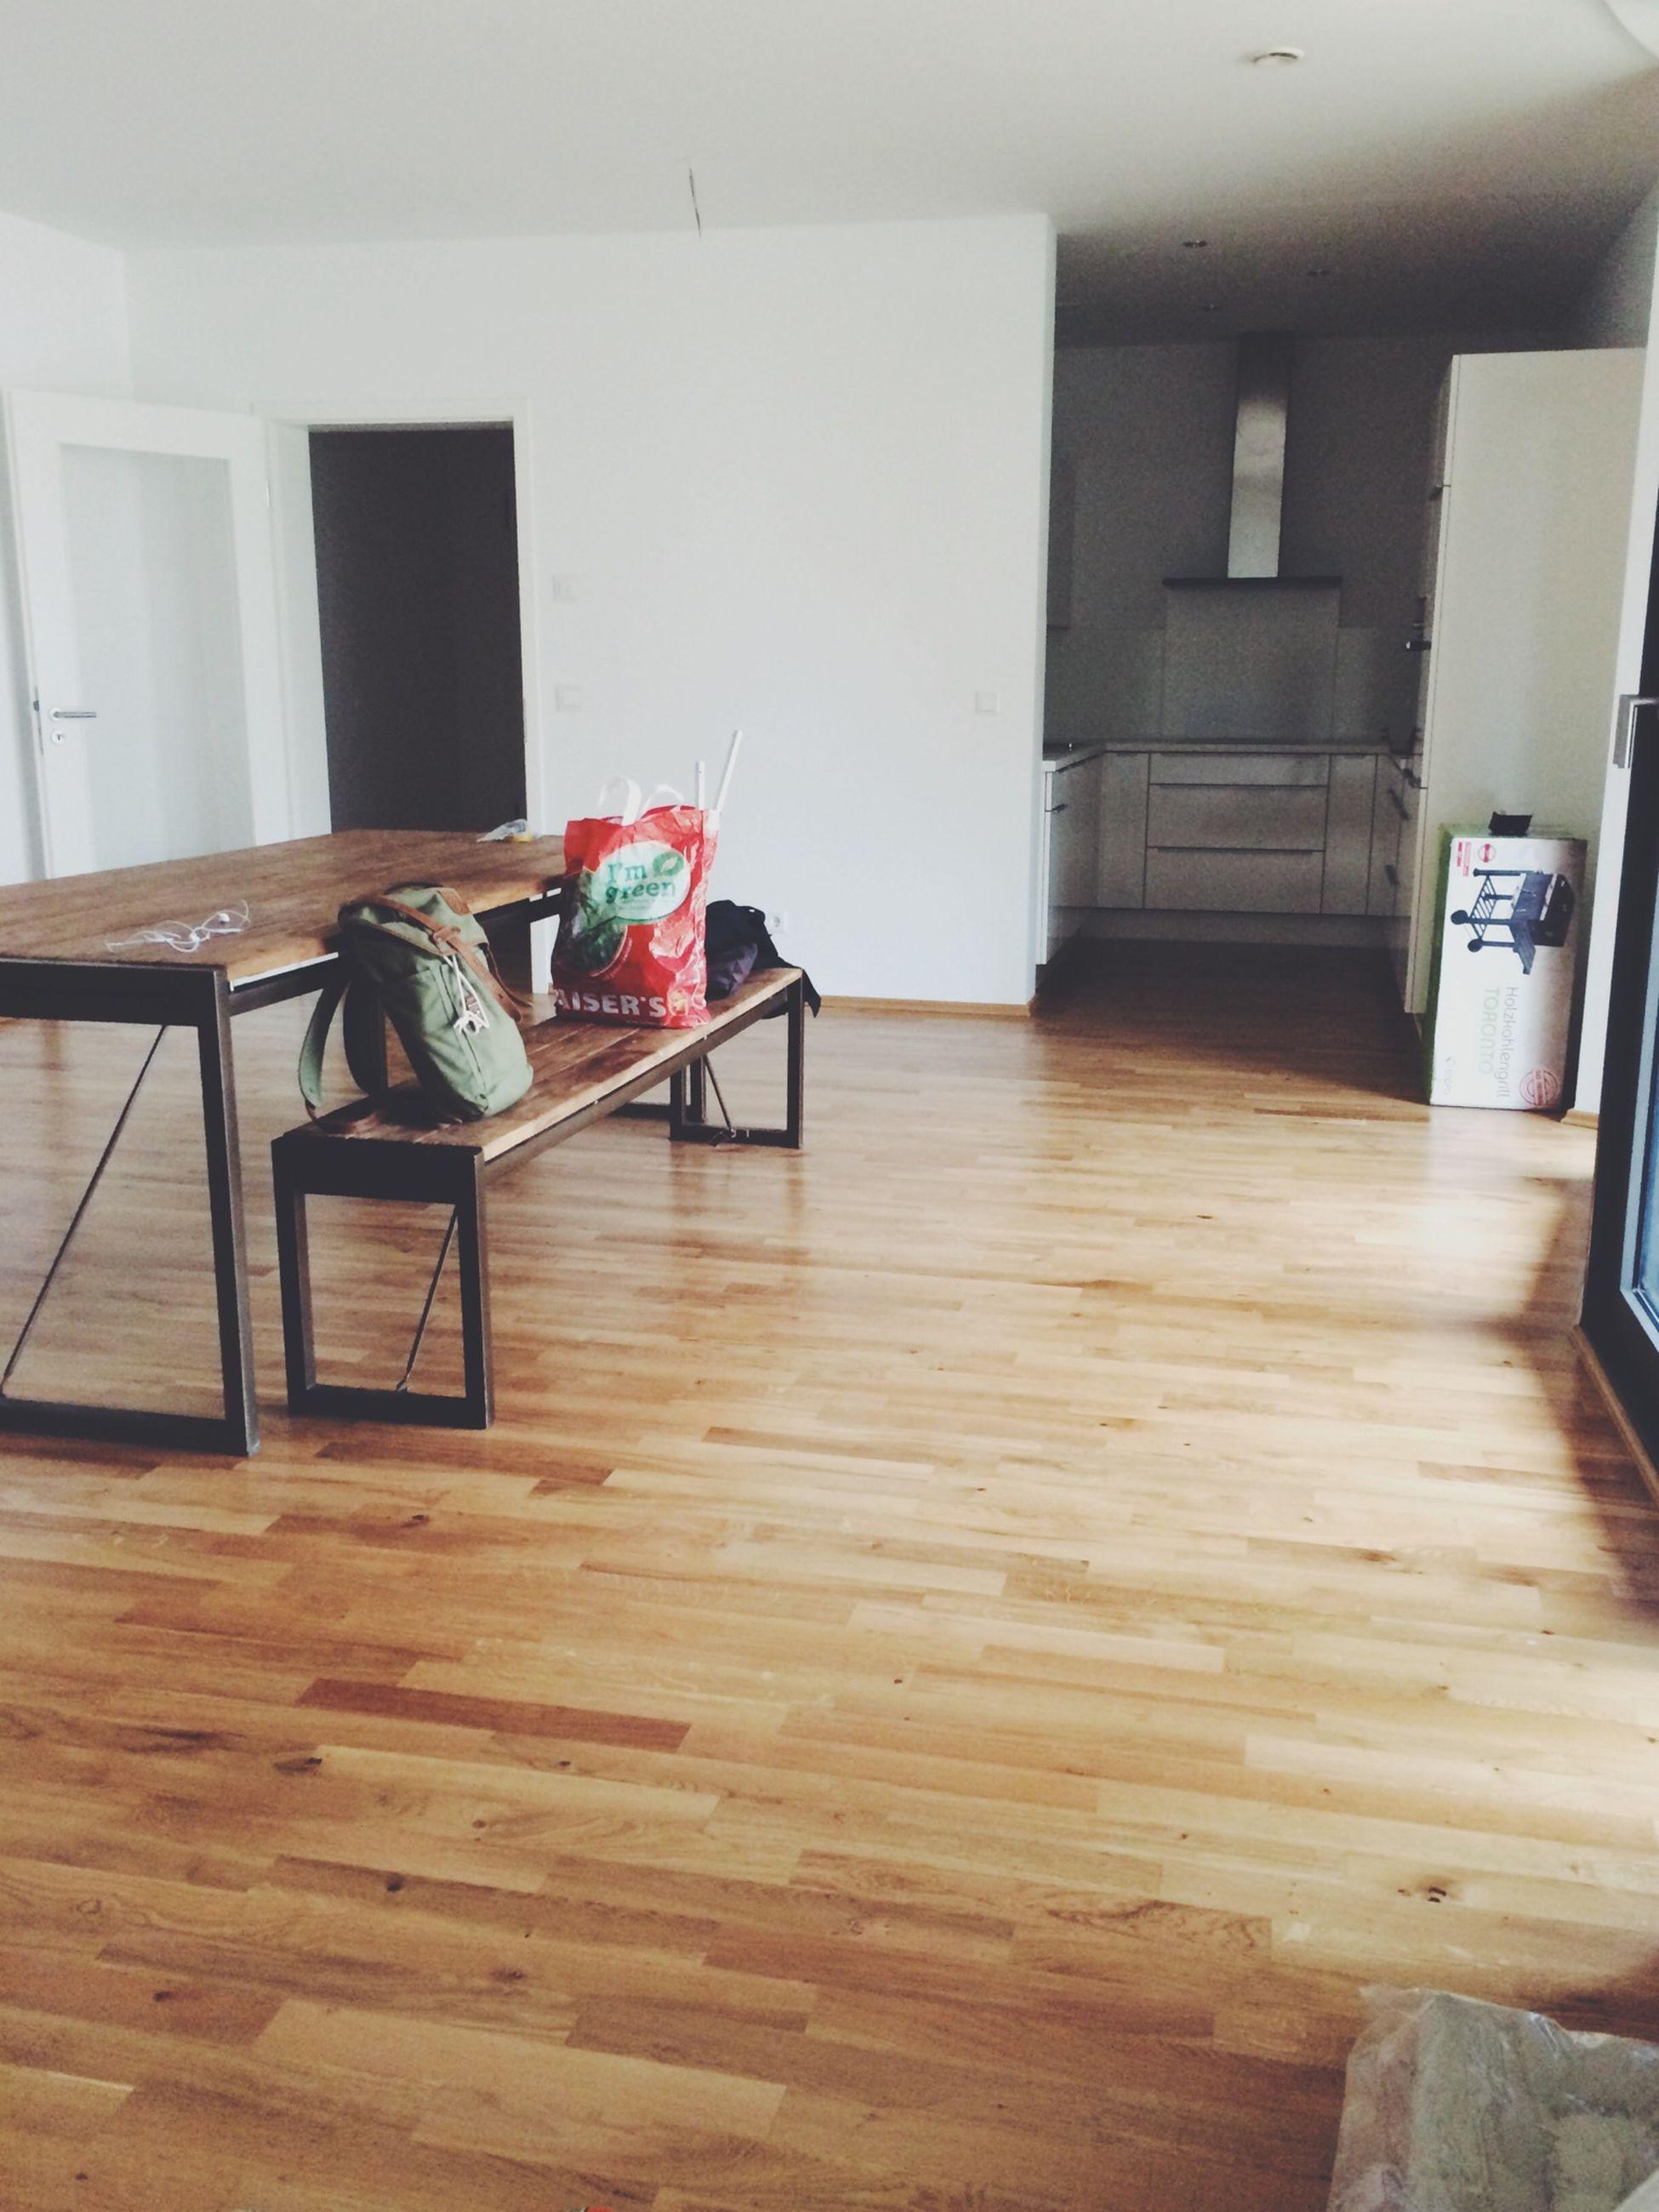 indoors, chair, empty, absence, architecture, built structure, table, flooring, wood - material, hardwood floor, furniture, home interior, no people, house, door, tiled floor, seat, day, sunlight, floor